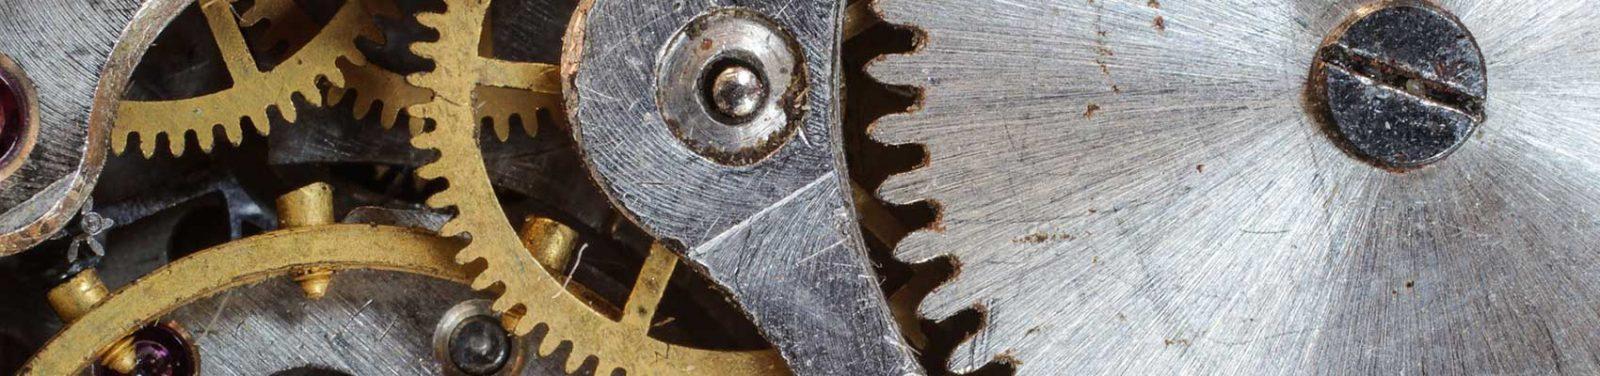 R&D Machining Industry